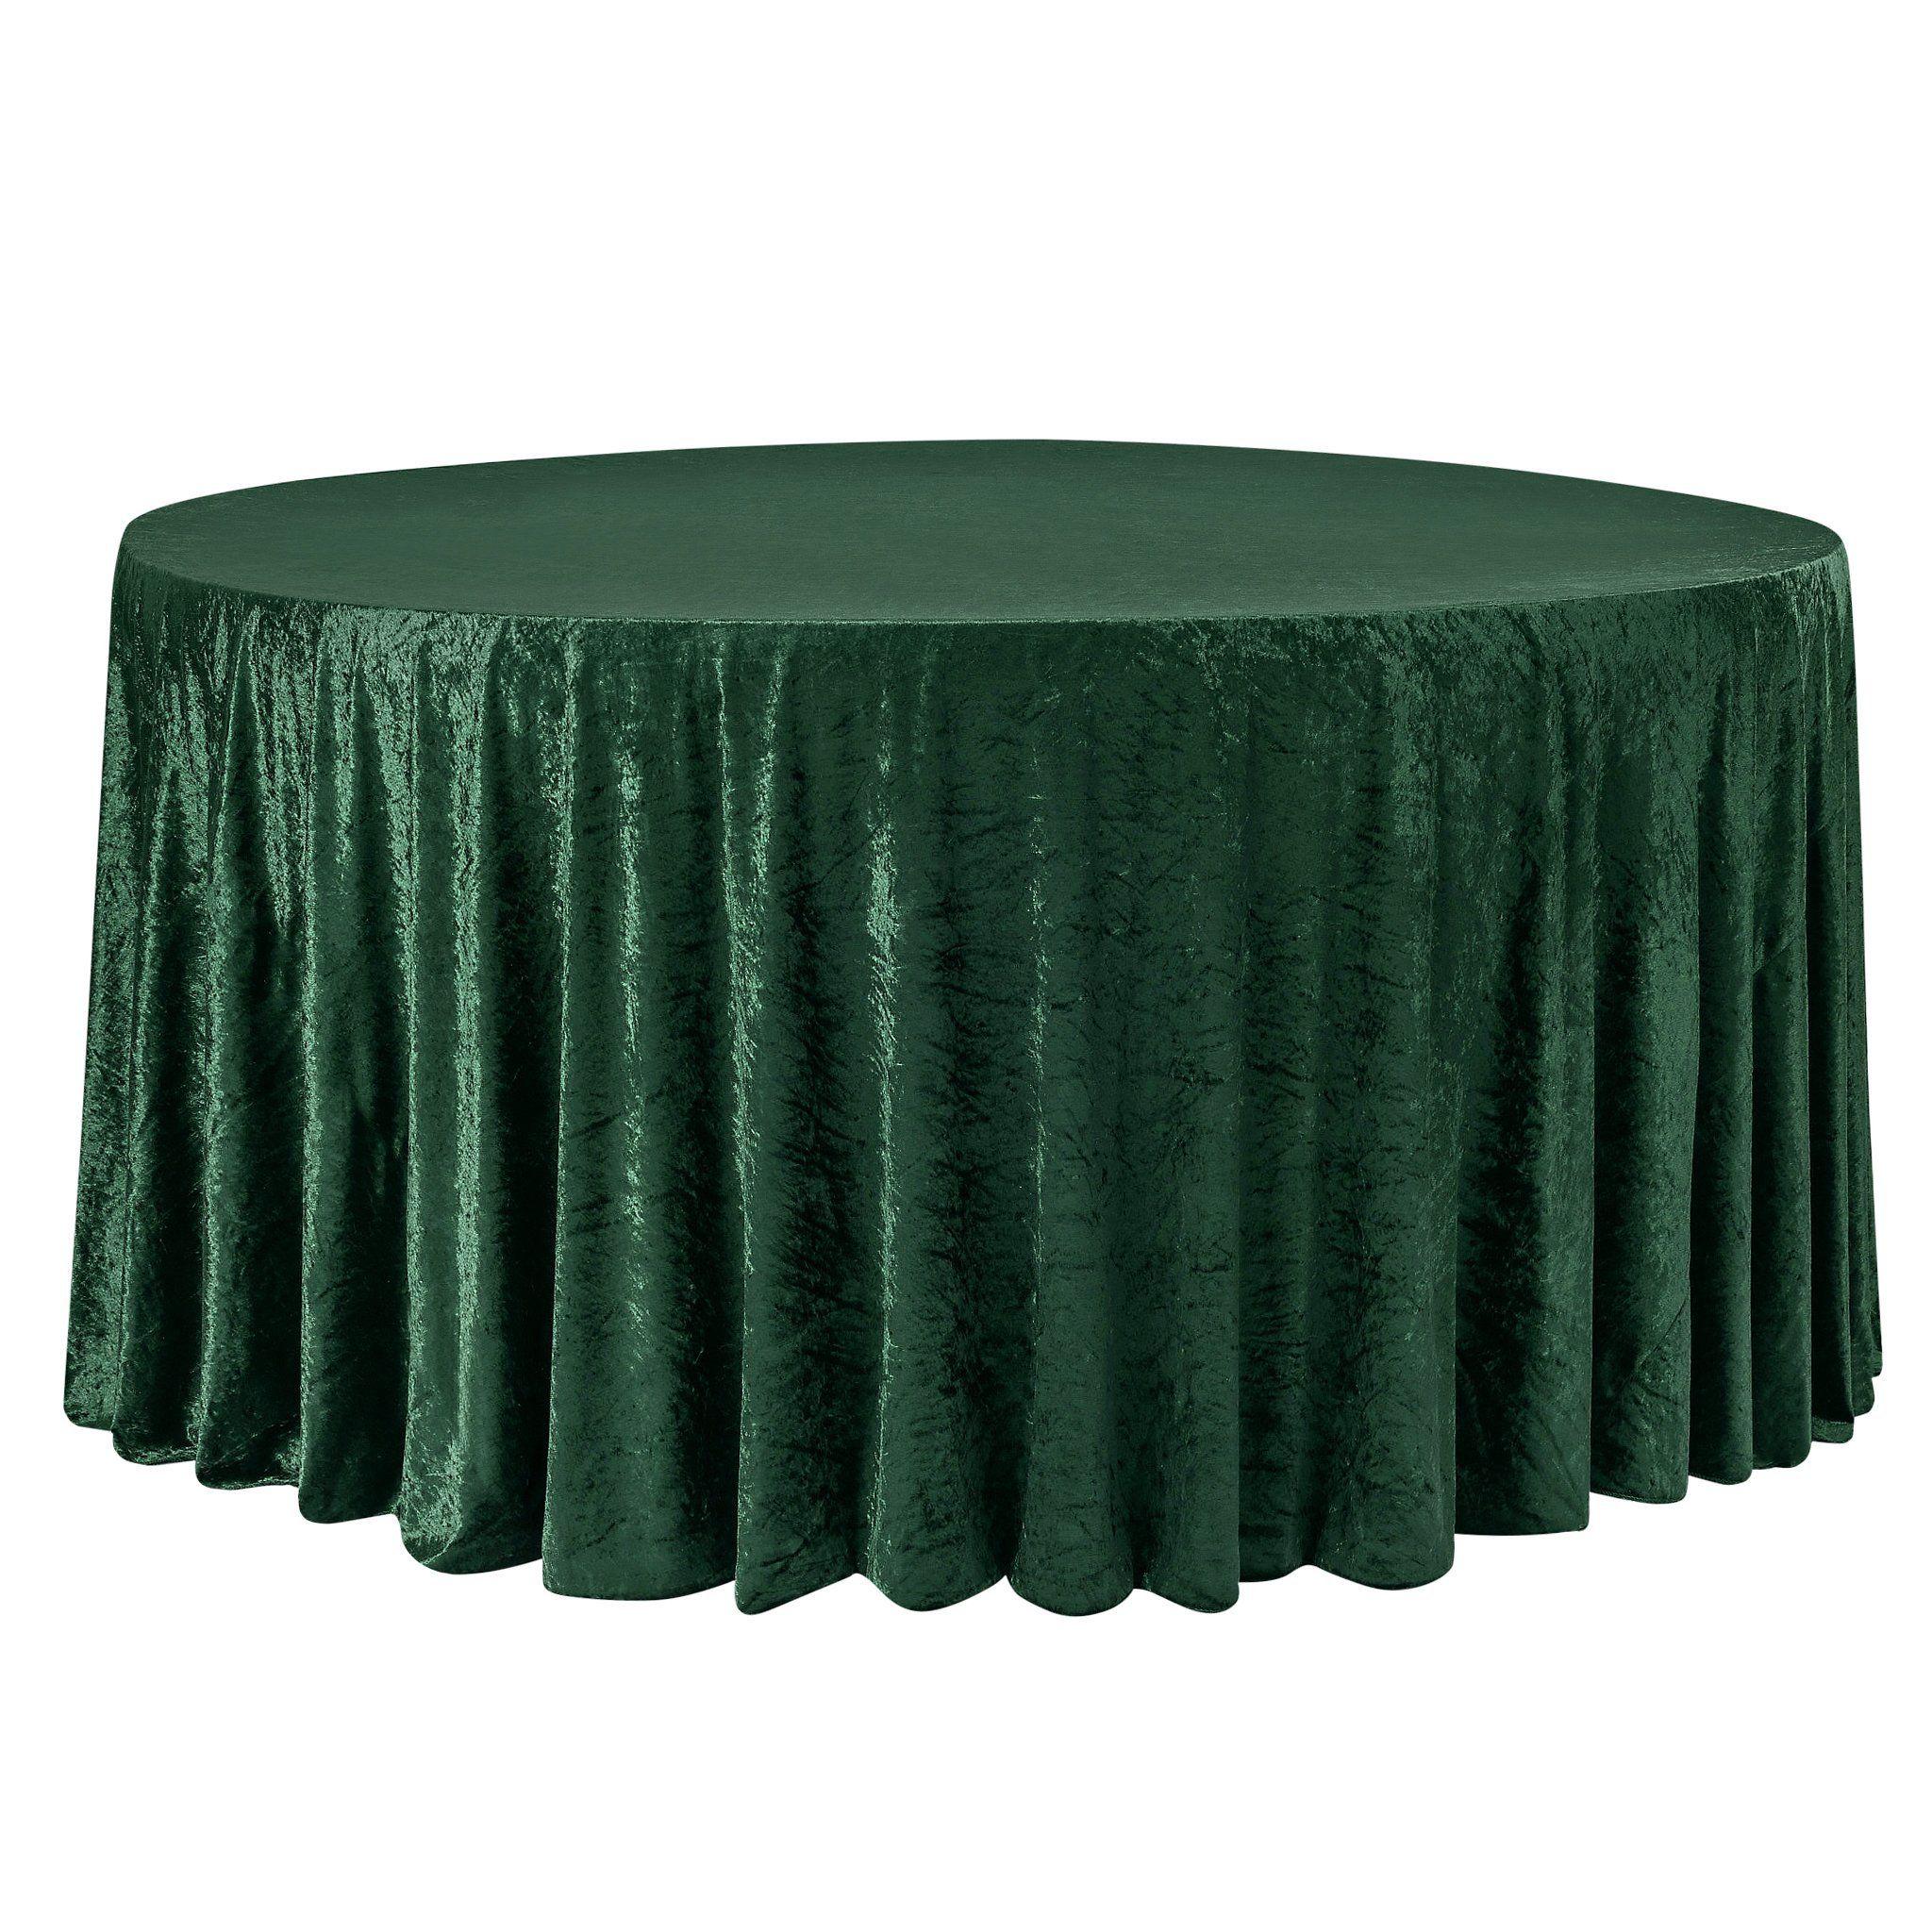 "Velvet 132"" Round Tablecloth - Emerald Green"